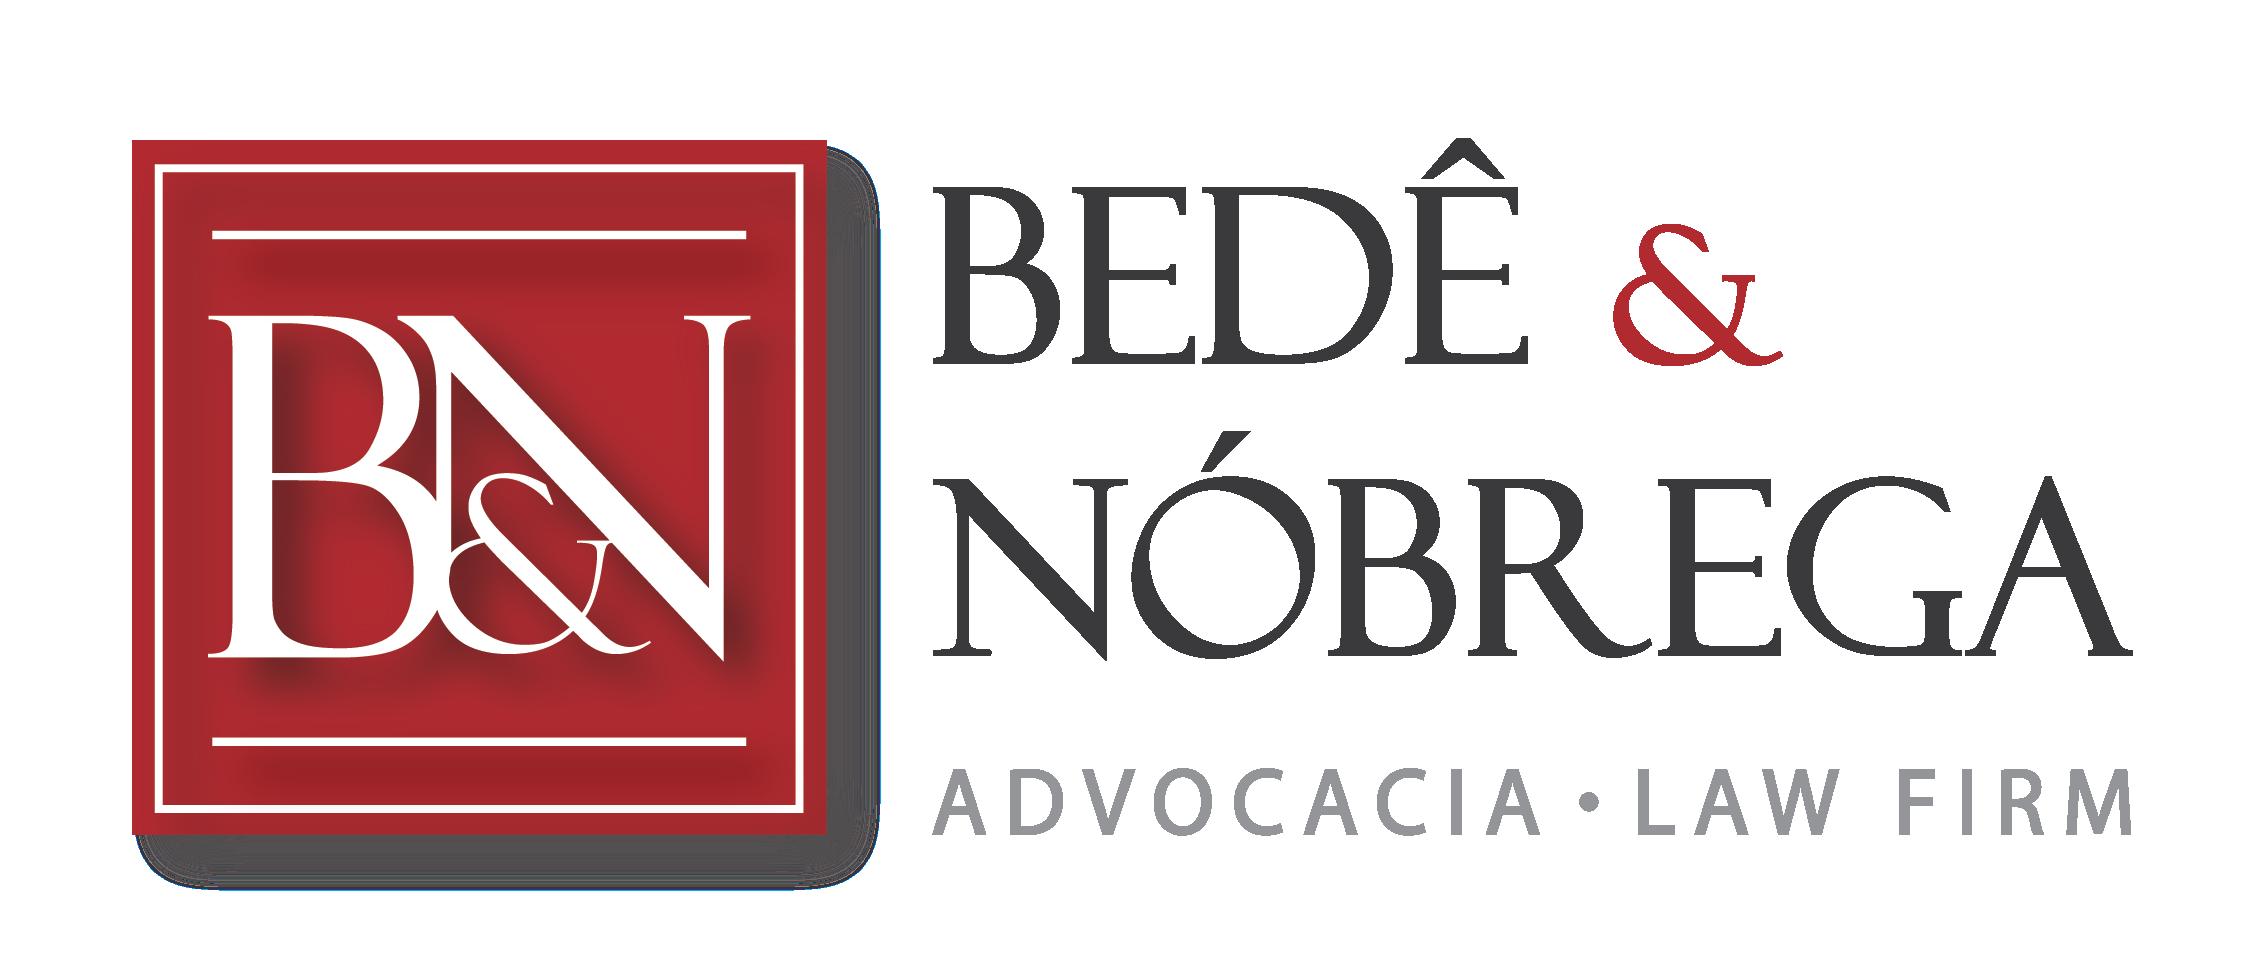 BEDÊ E NÓBREGA - R01-05 - PNG